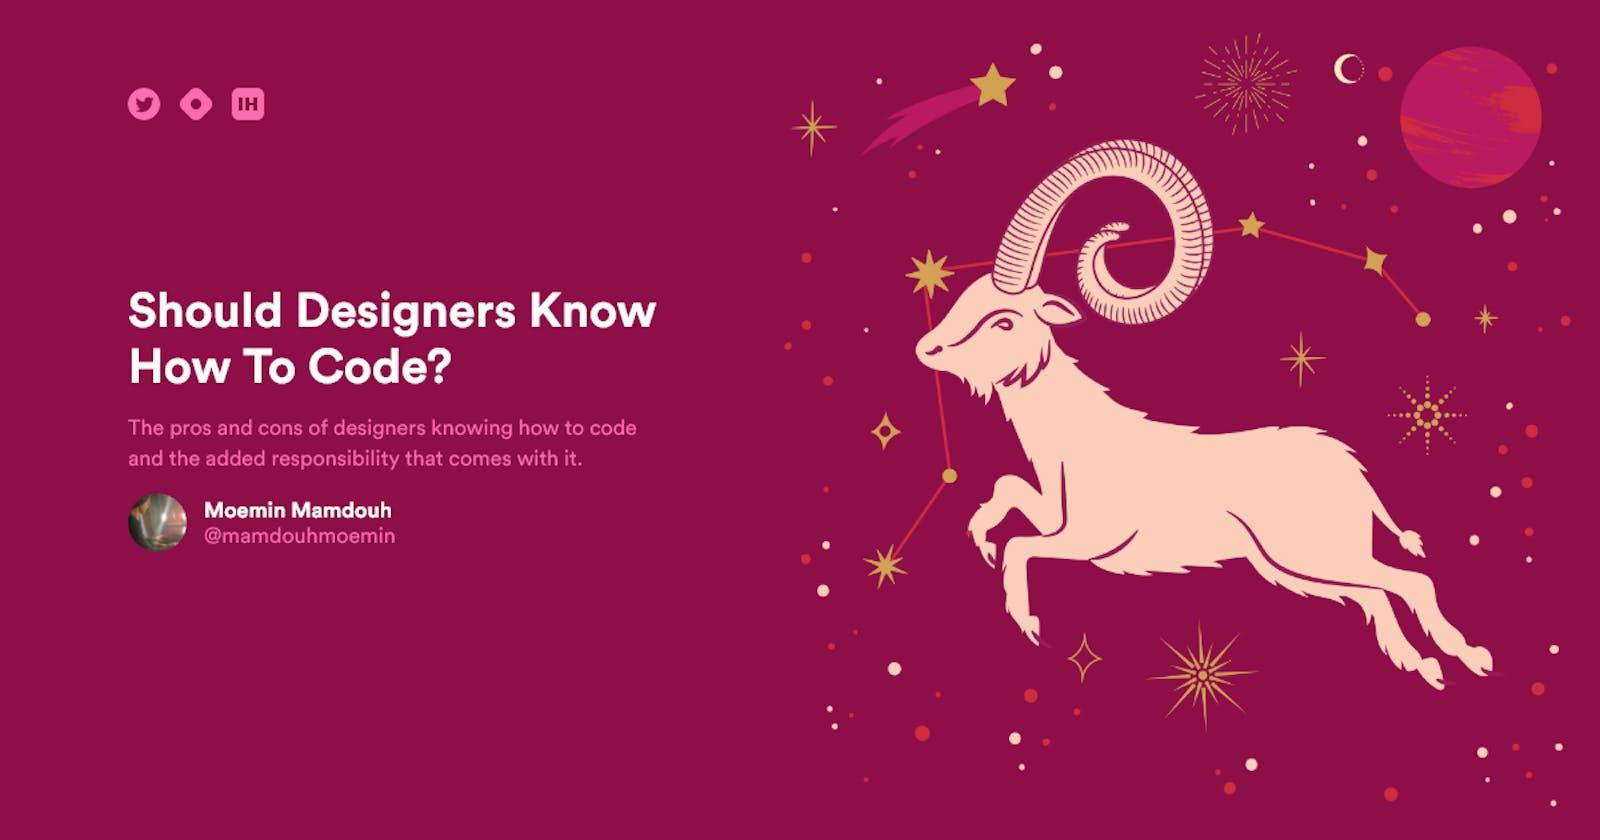 Developers, do you think Designers should code?